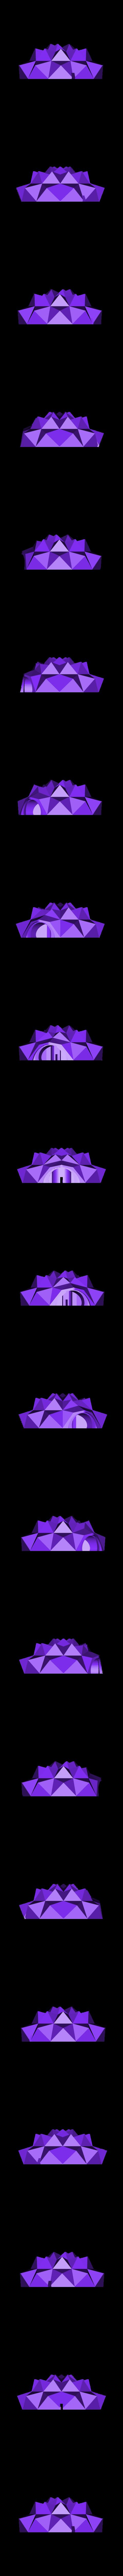 Spikey_Top.STL Download free STL file Squishy Turtle • 3D print template, jakejake